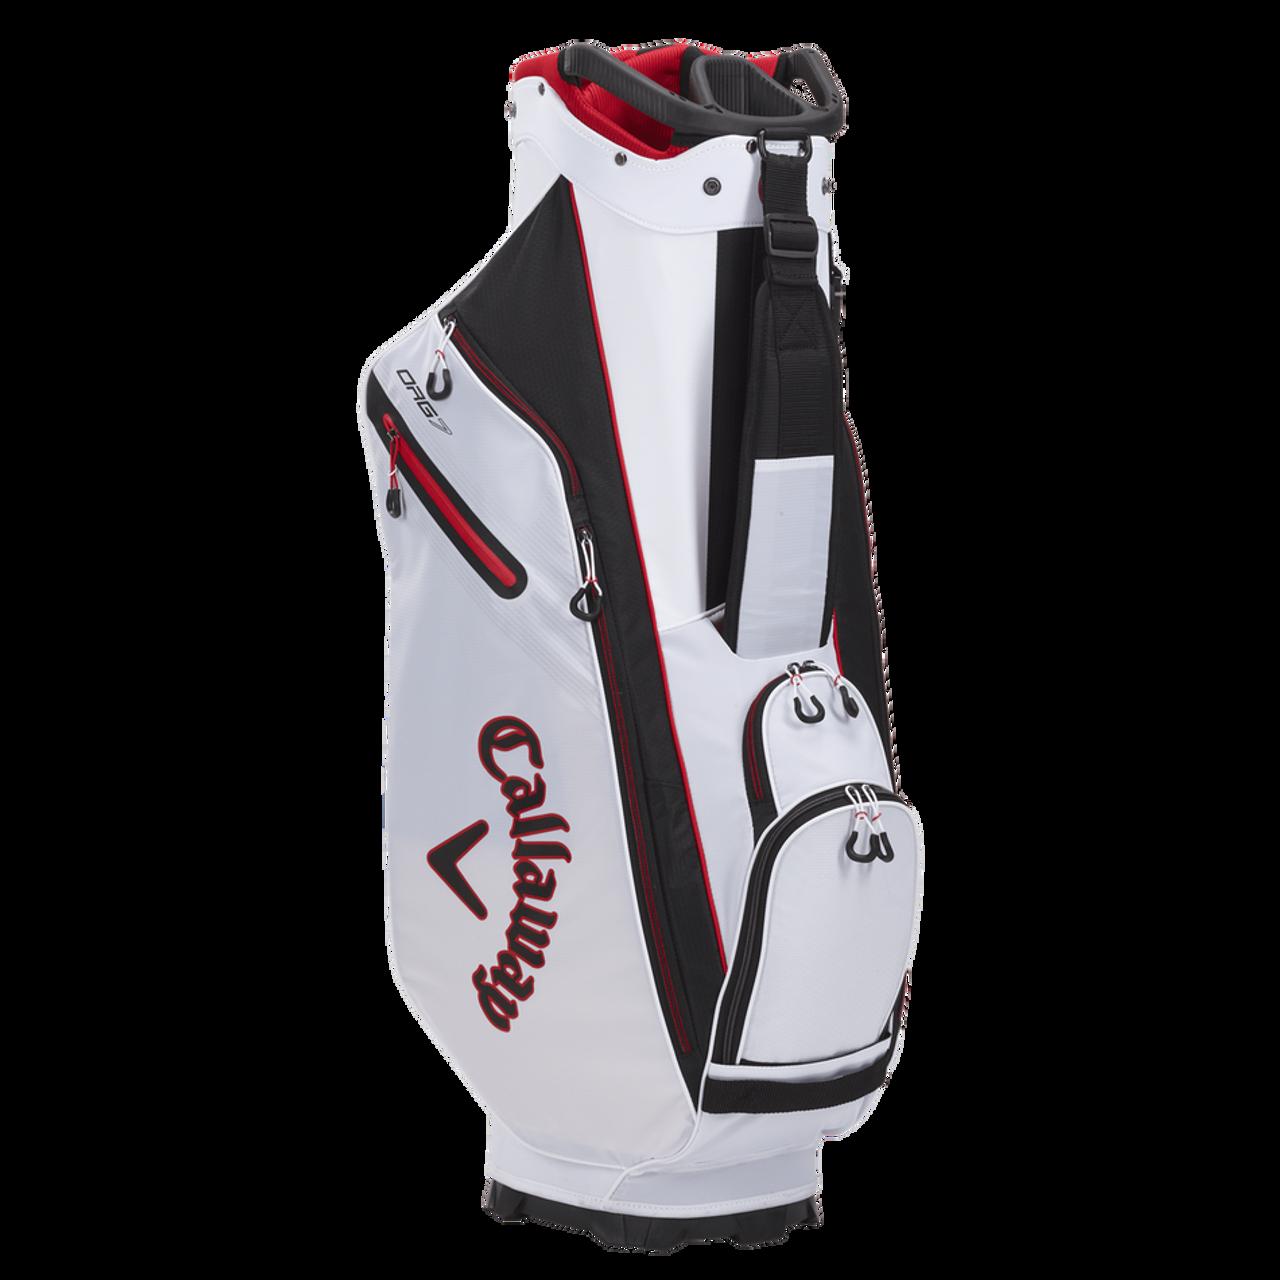 Callaway Org 7 Cart Bag 2021 - White / Black / Fire Red